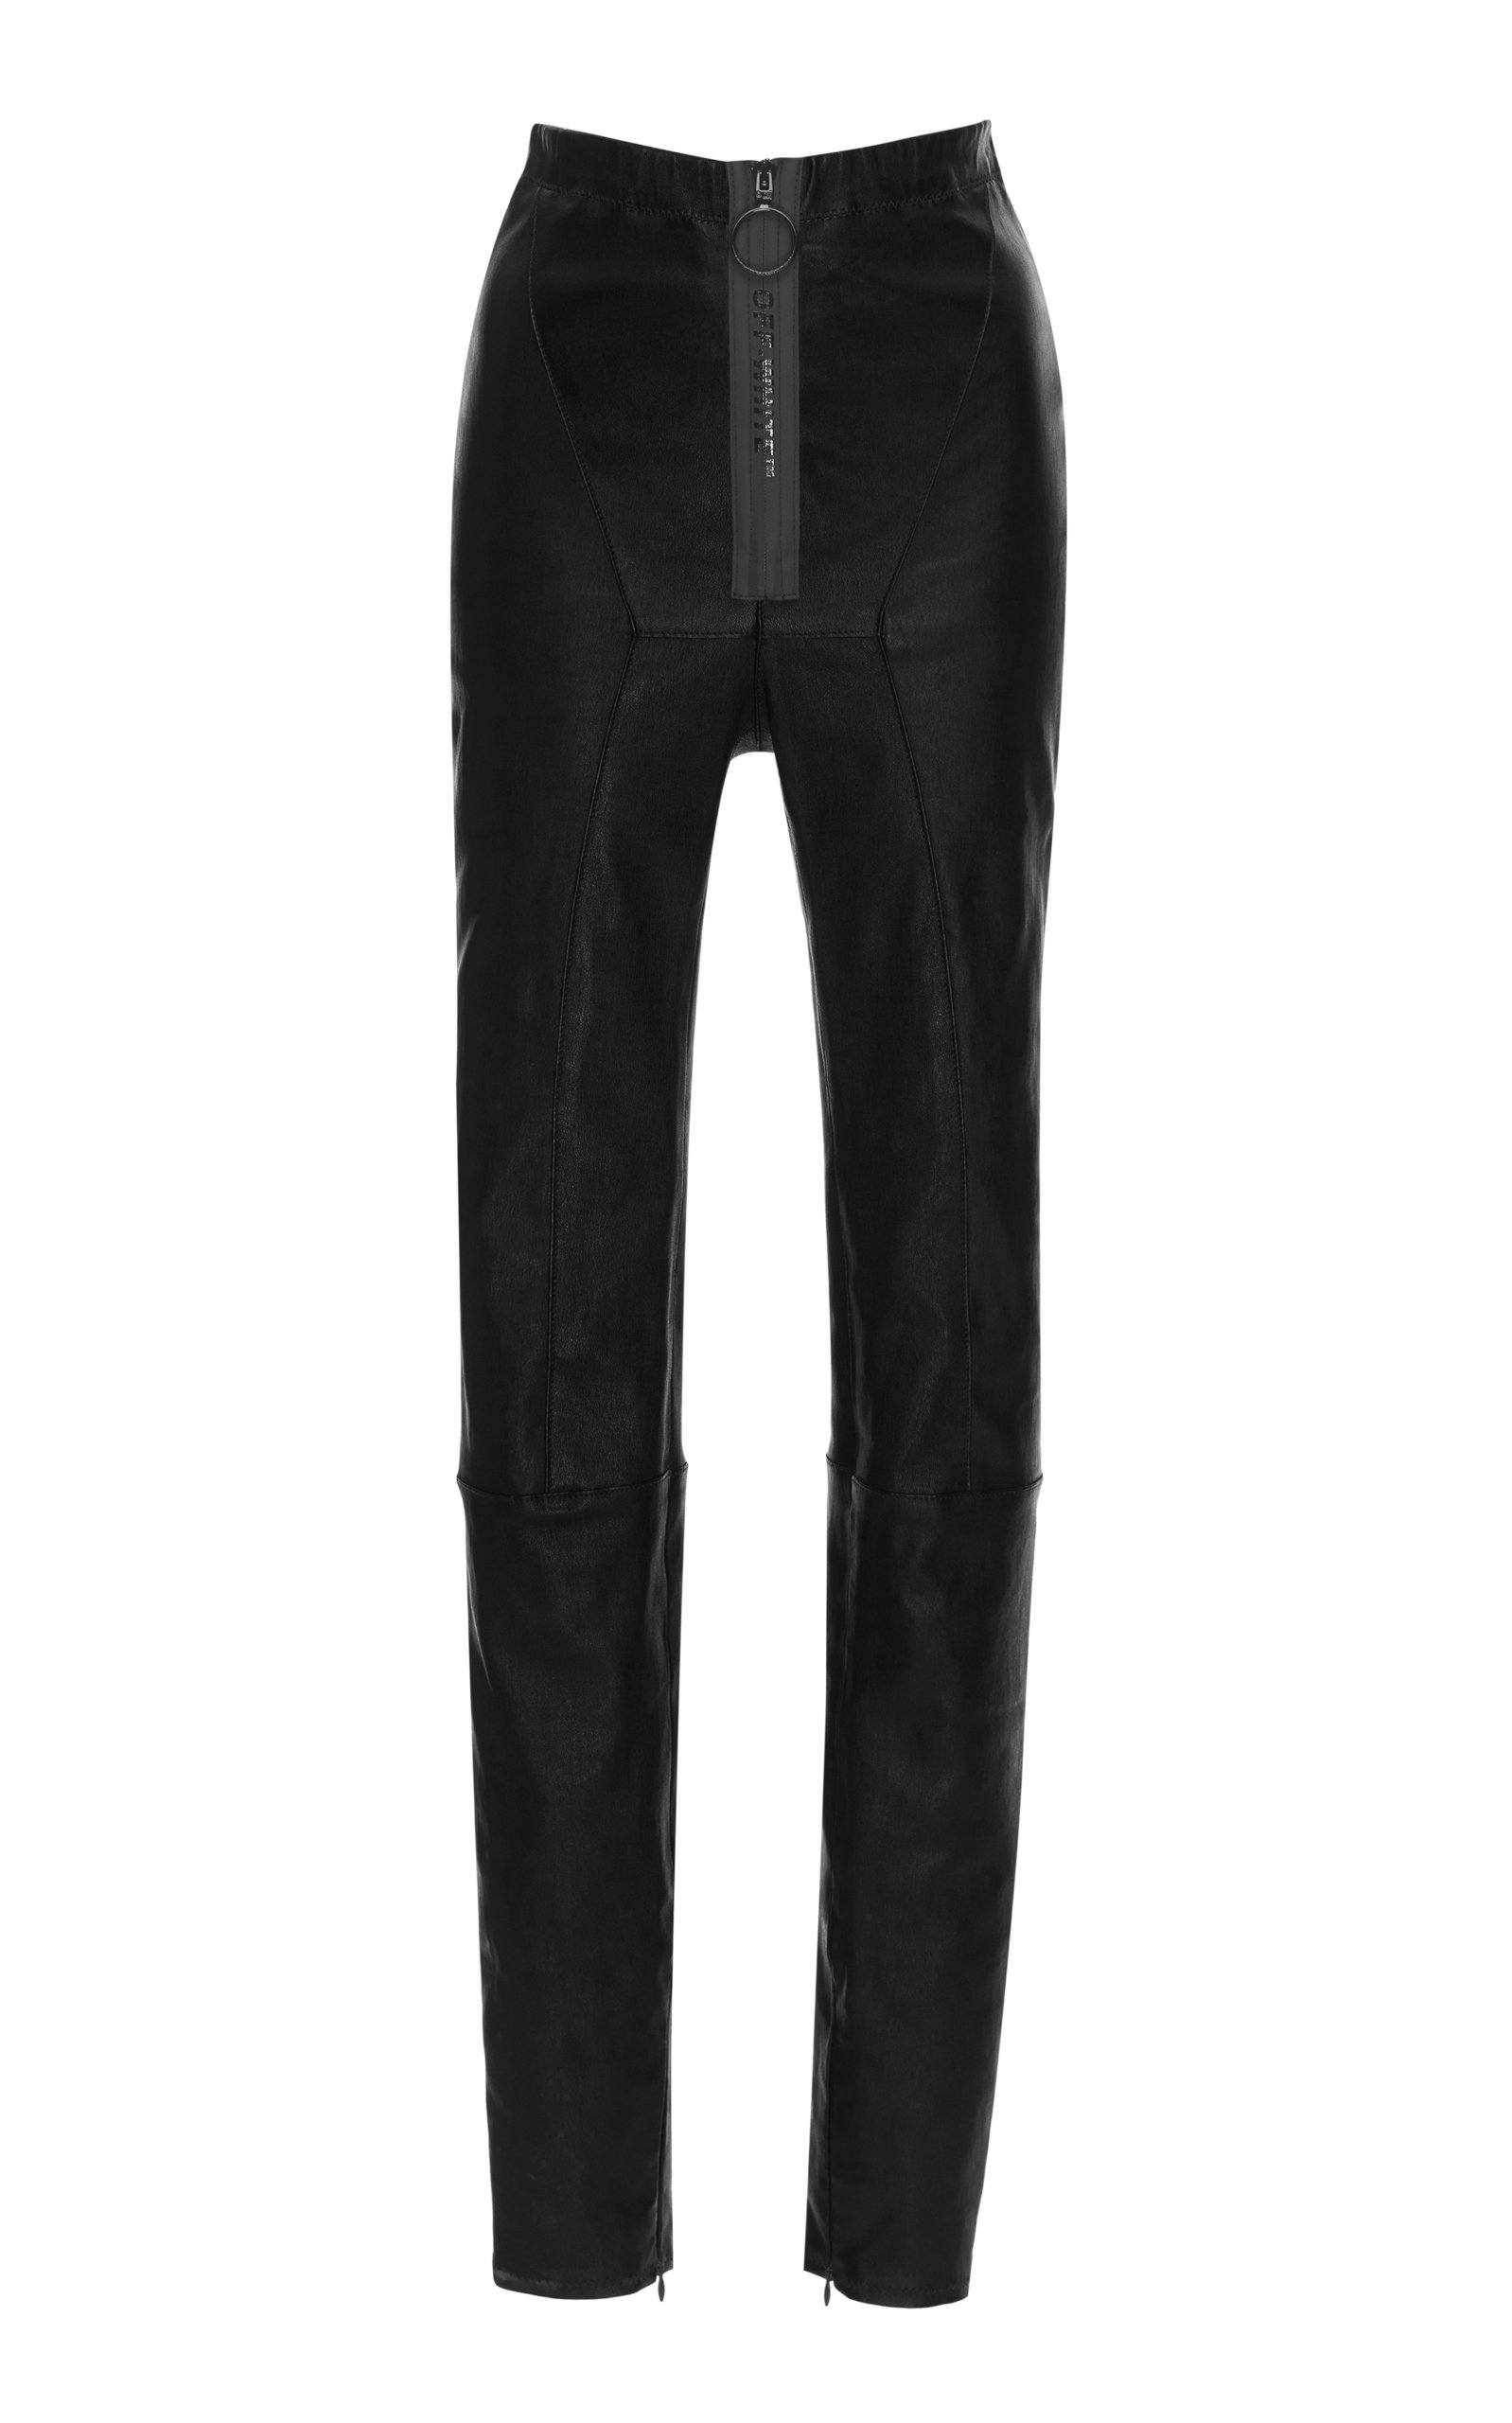 f08533c5061e4 Paneled Leather Leggings by Off-White c/o Virgil Abloh   Moda Operandi